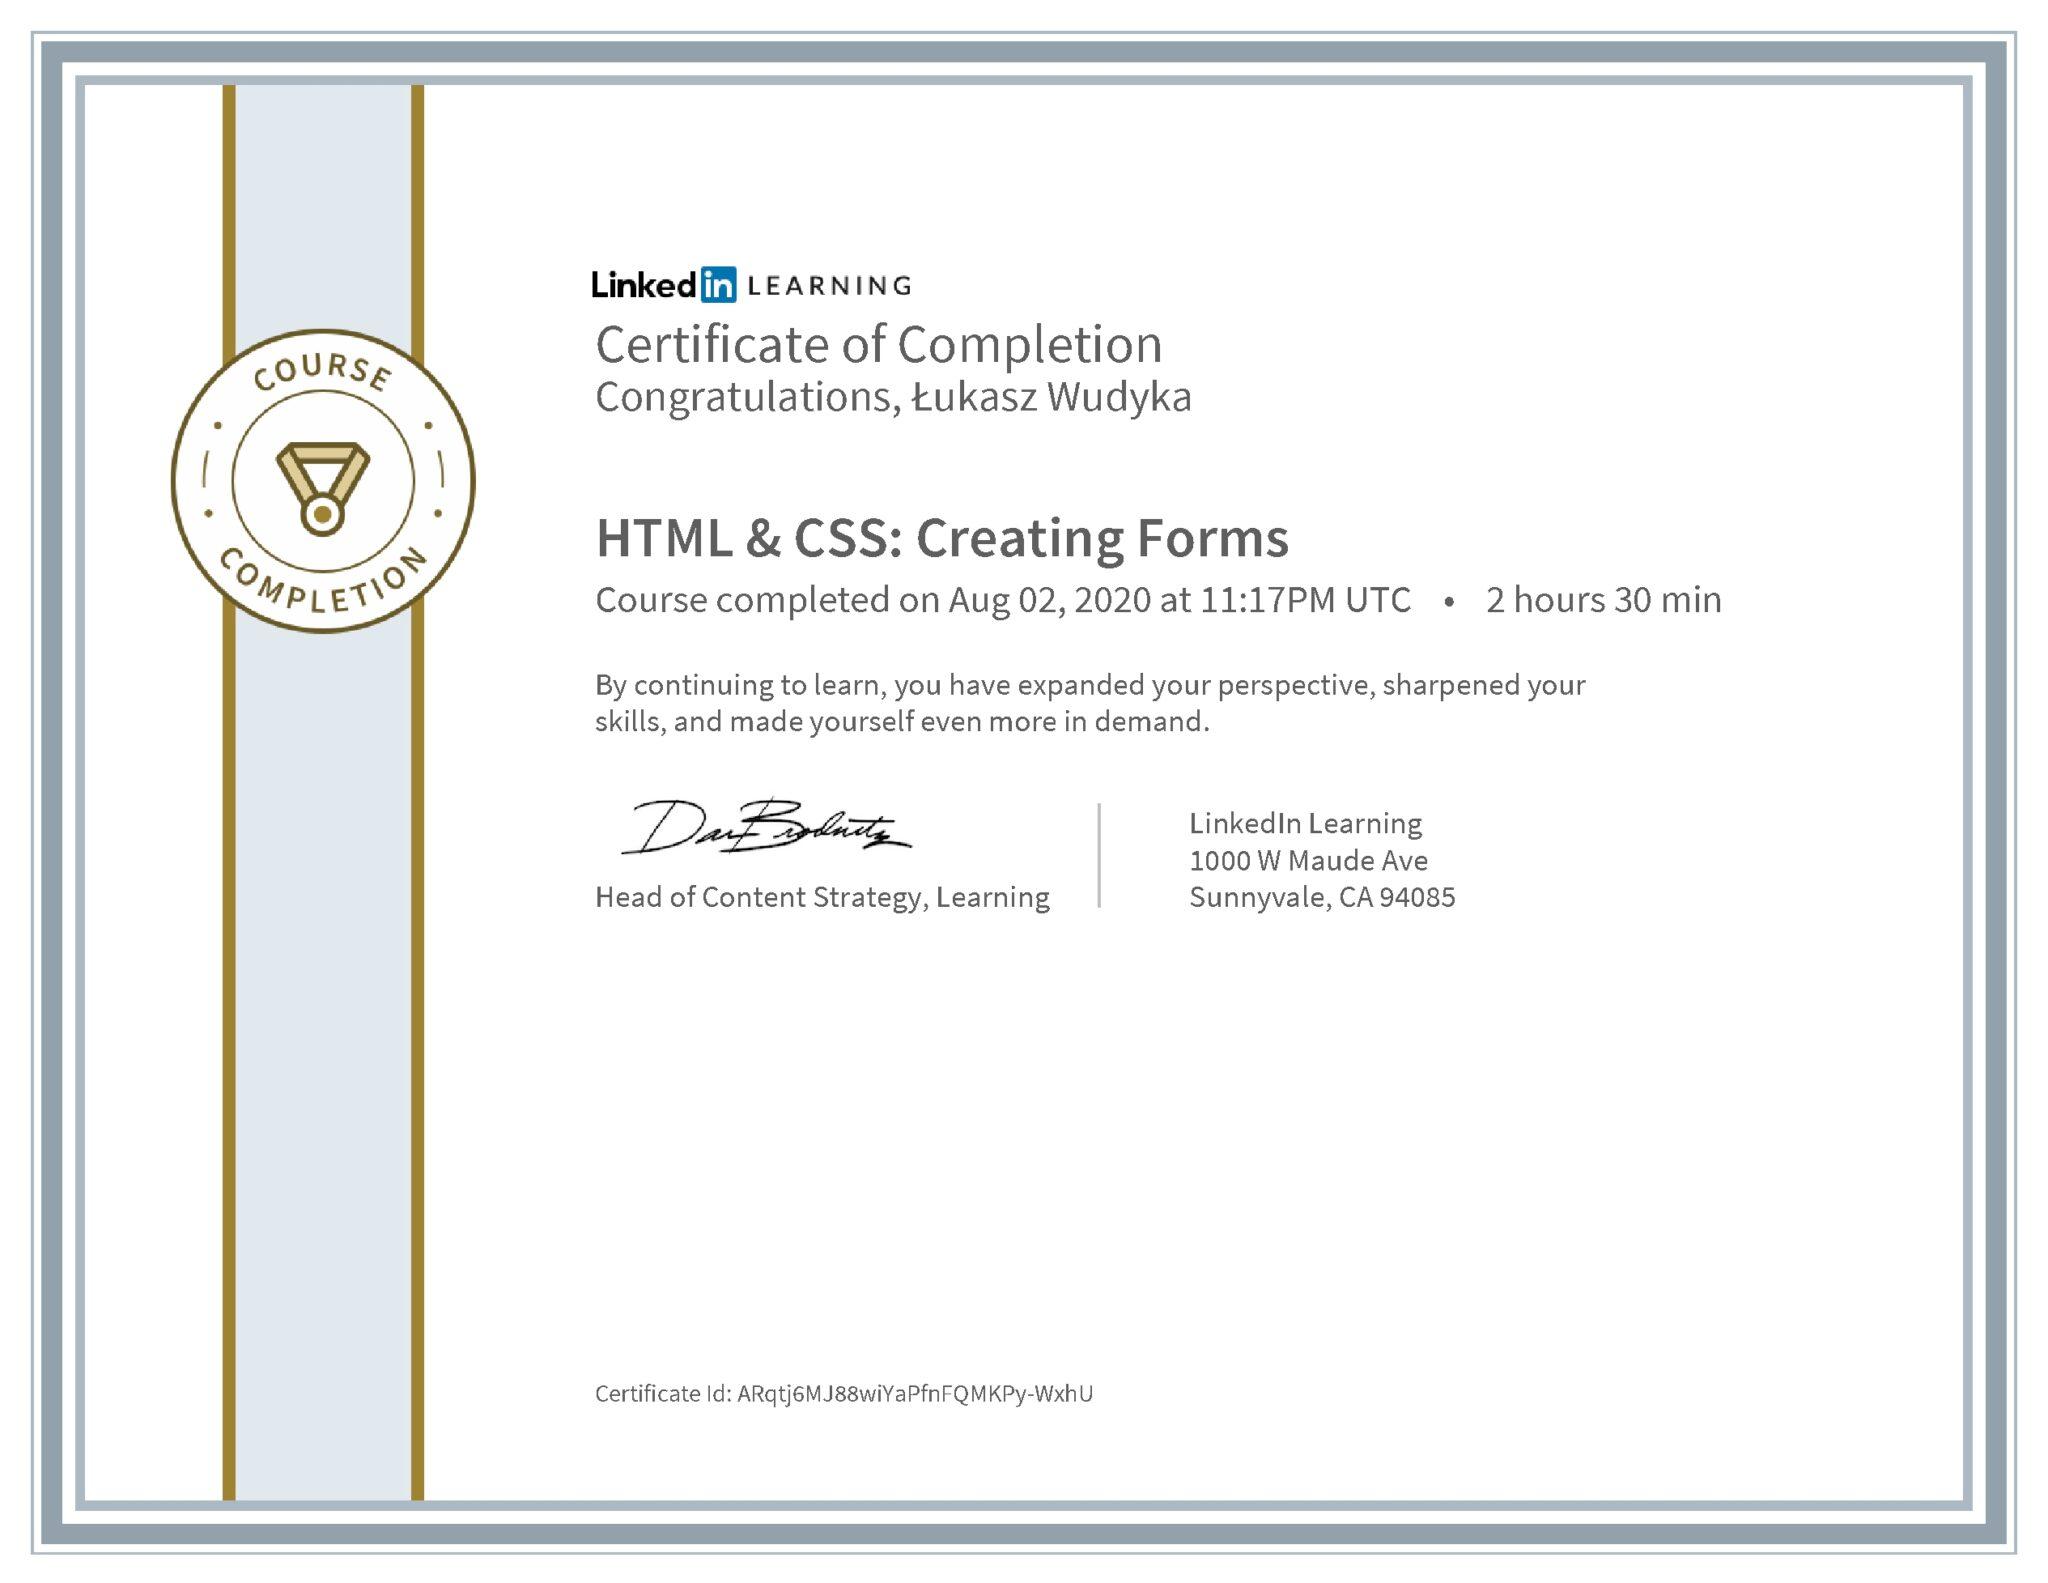 Łukasz Wudyka certyfikat LinkedIn HTML & CSS: Creating Forms